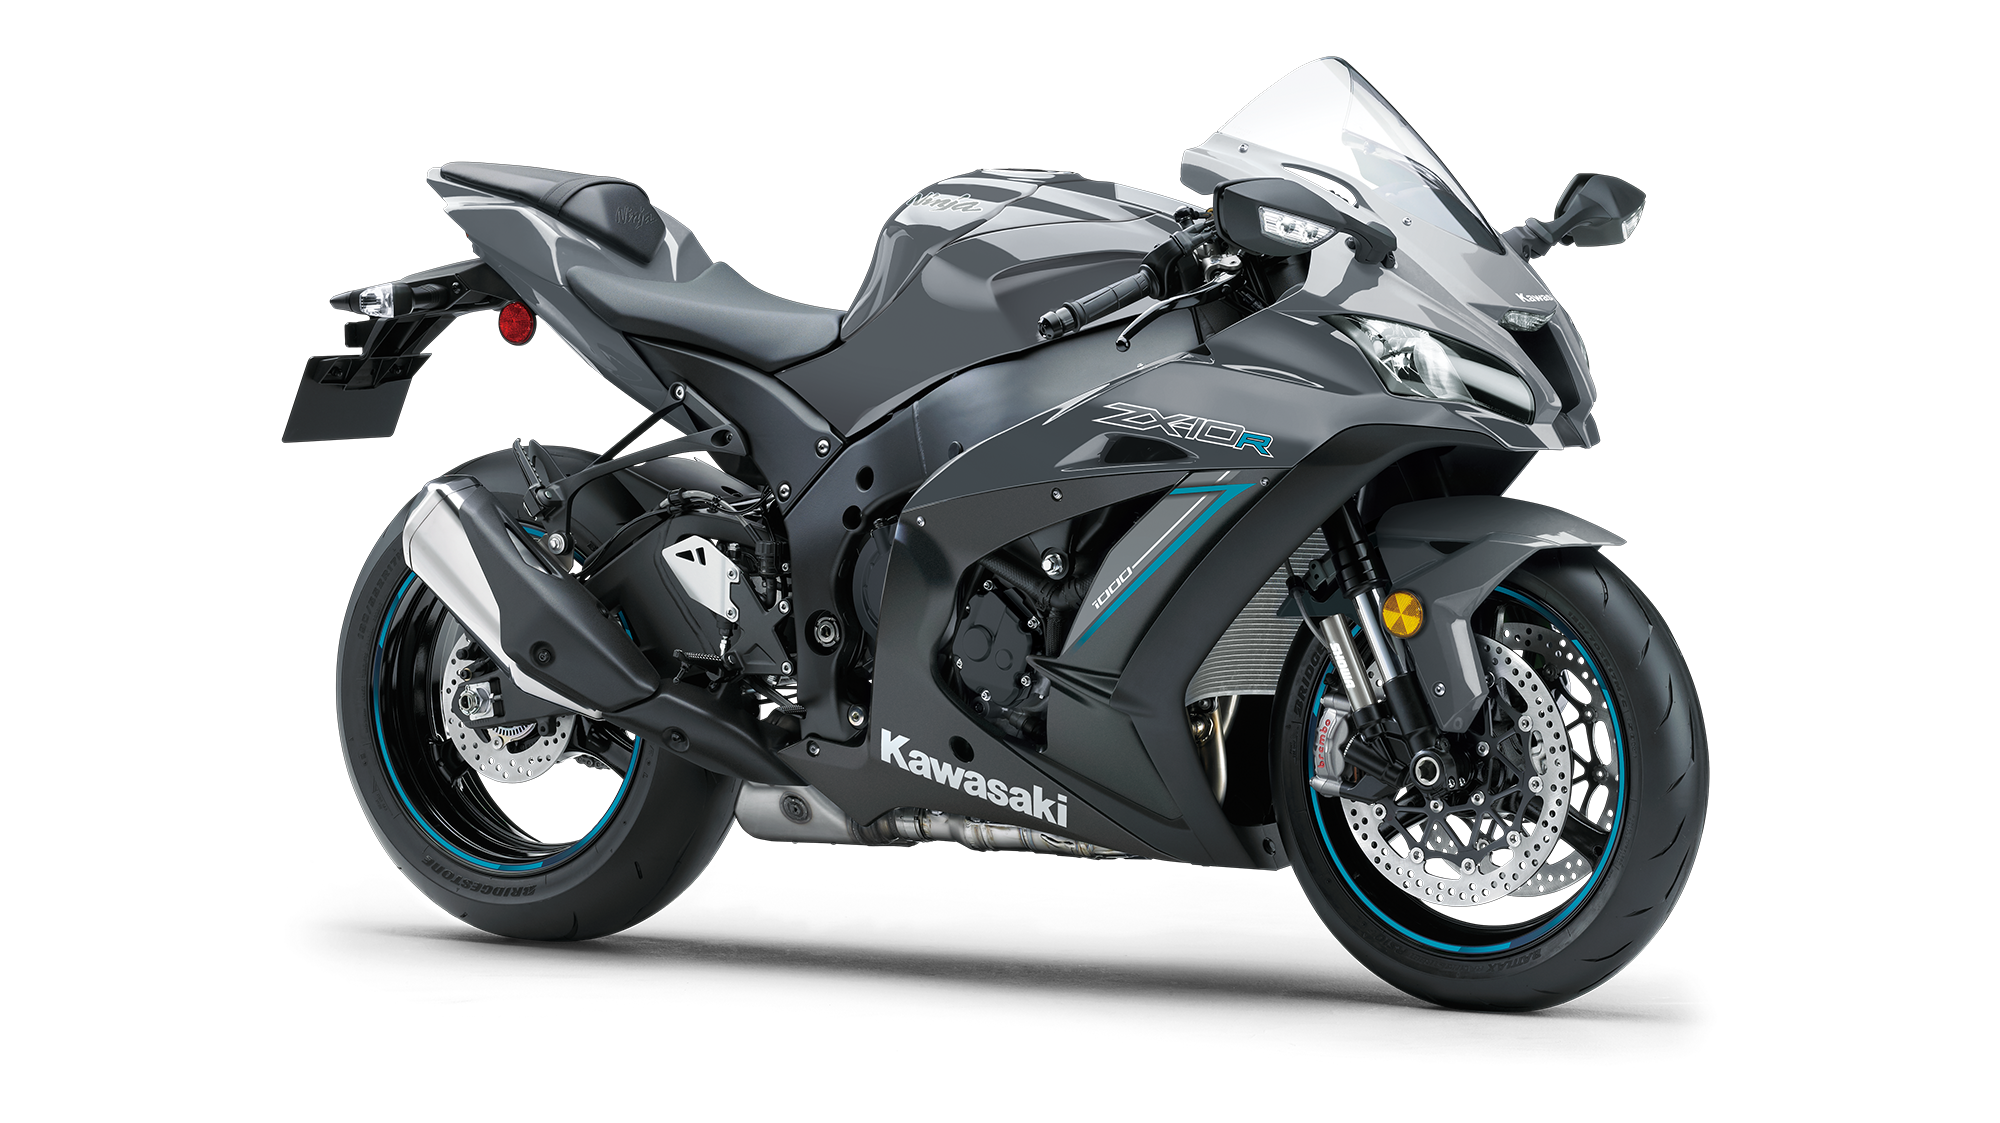 Kawasakicom Diagrams Circuit Diagram Schema Kawasaki Vulcan 900 Wiring For A Motorcycle Com Schemes Superbike Motorcycles Atv Sxs Jet